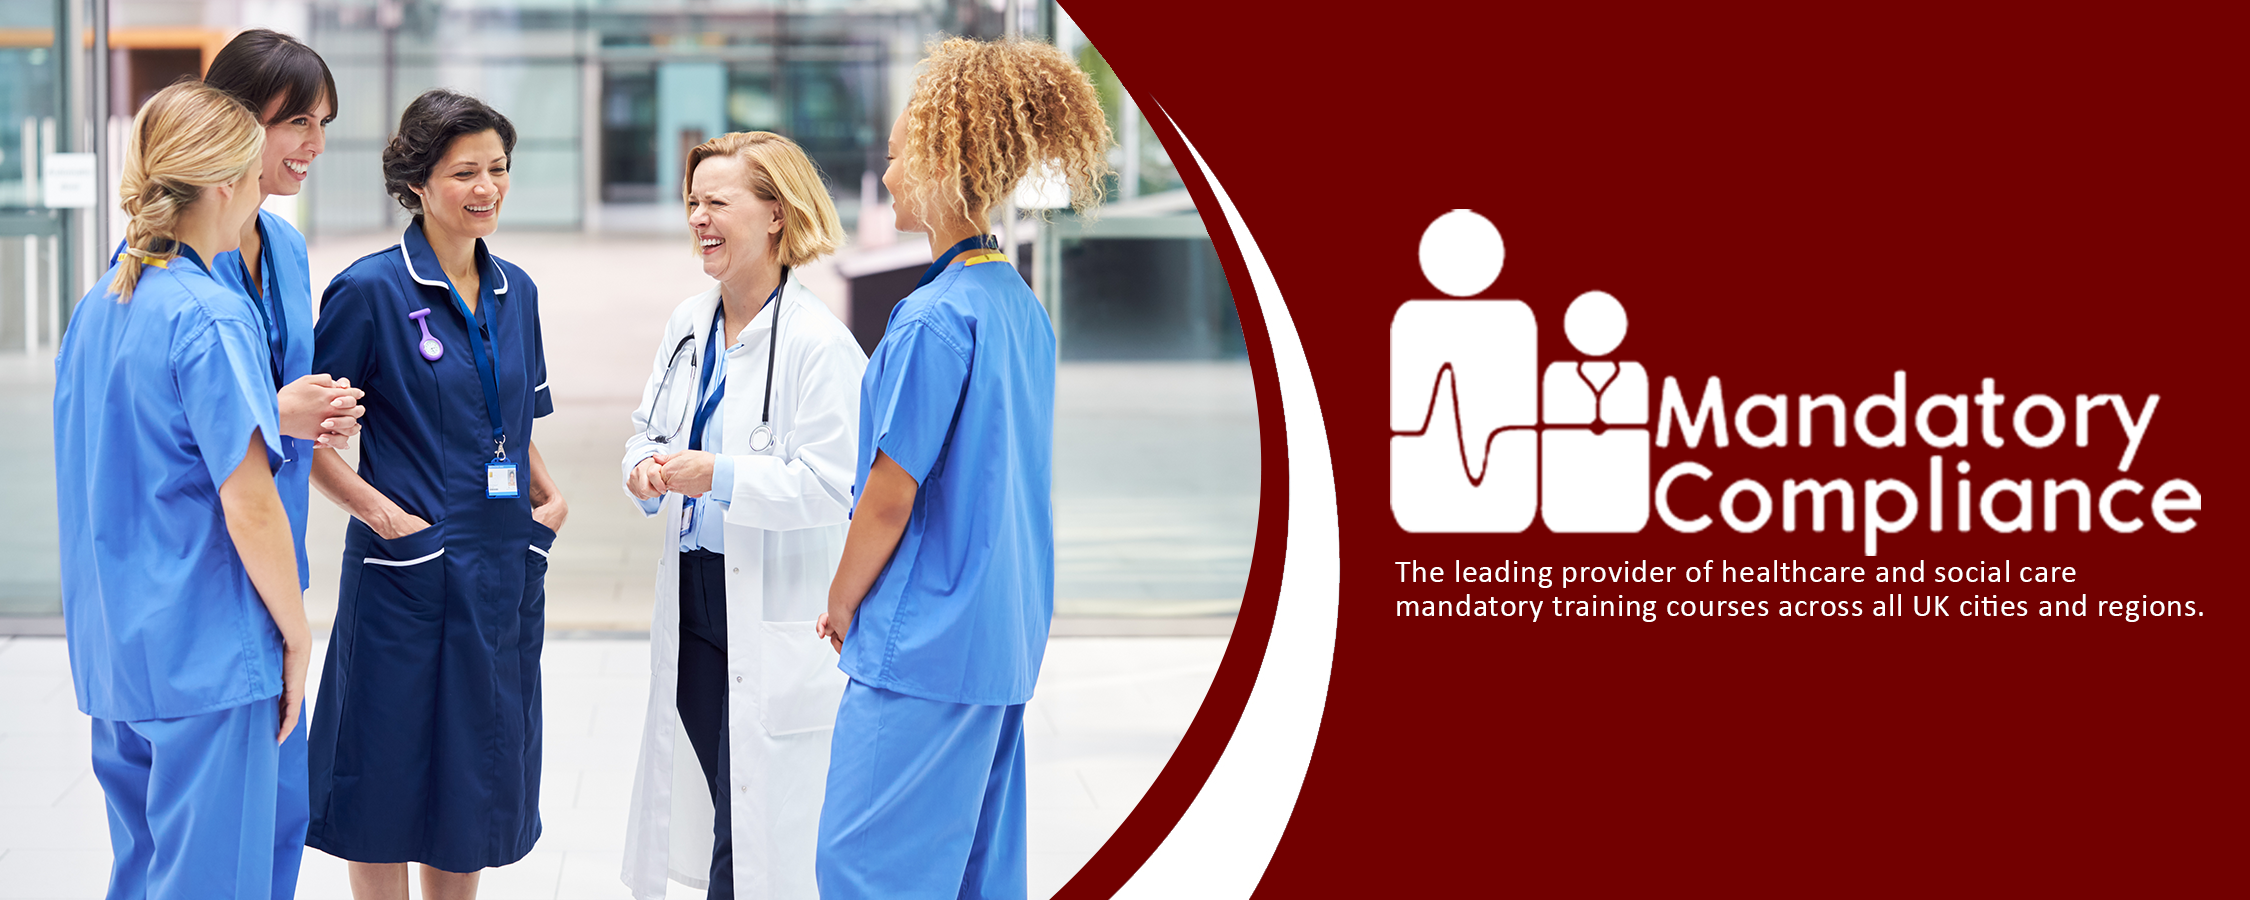 Care Certificate Assessor - E-Learning-Courses-Mandatory-Compliance-UK-